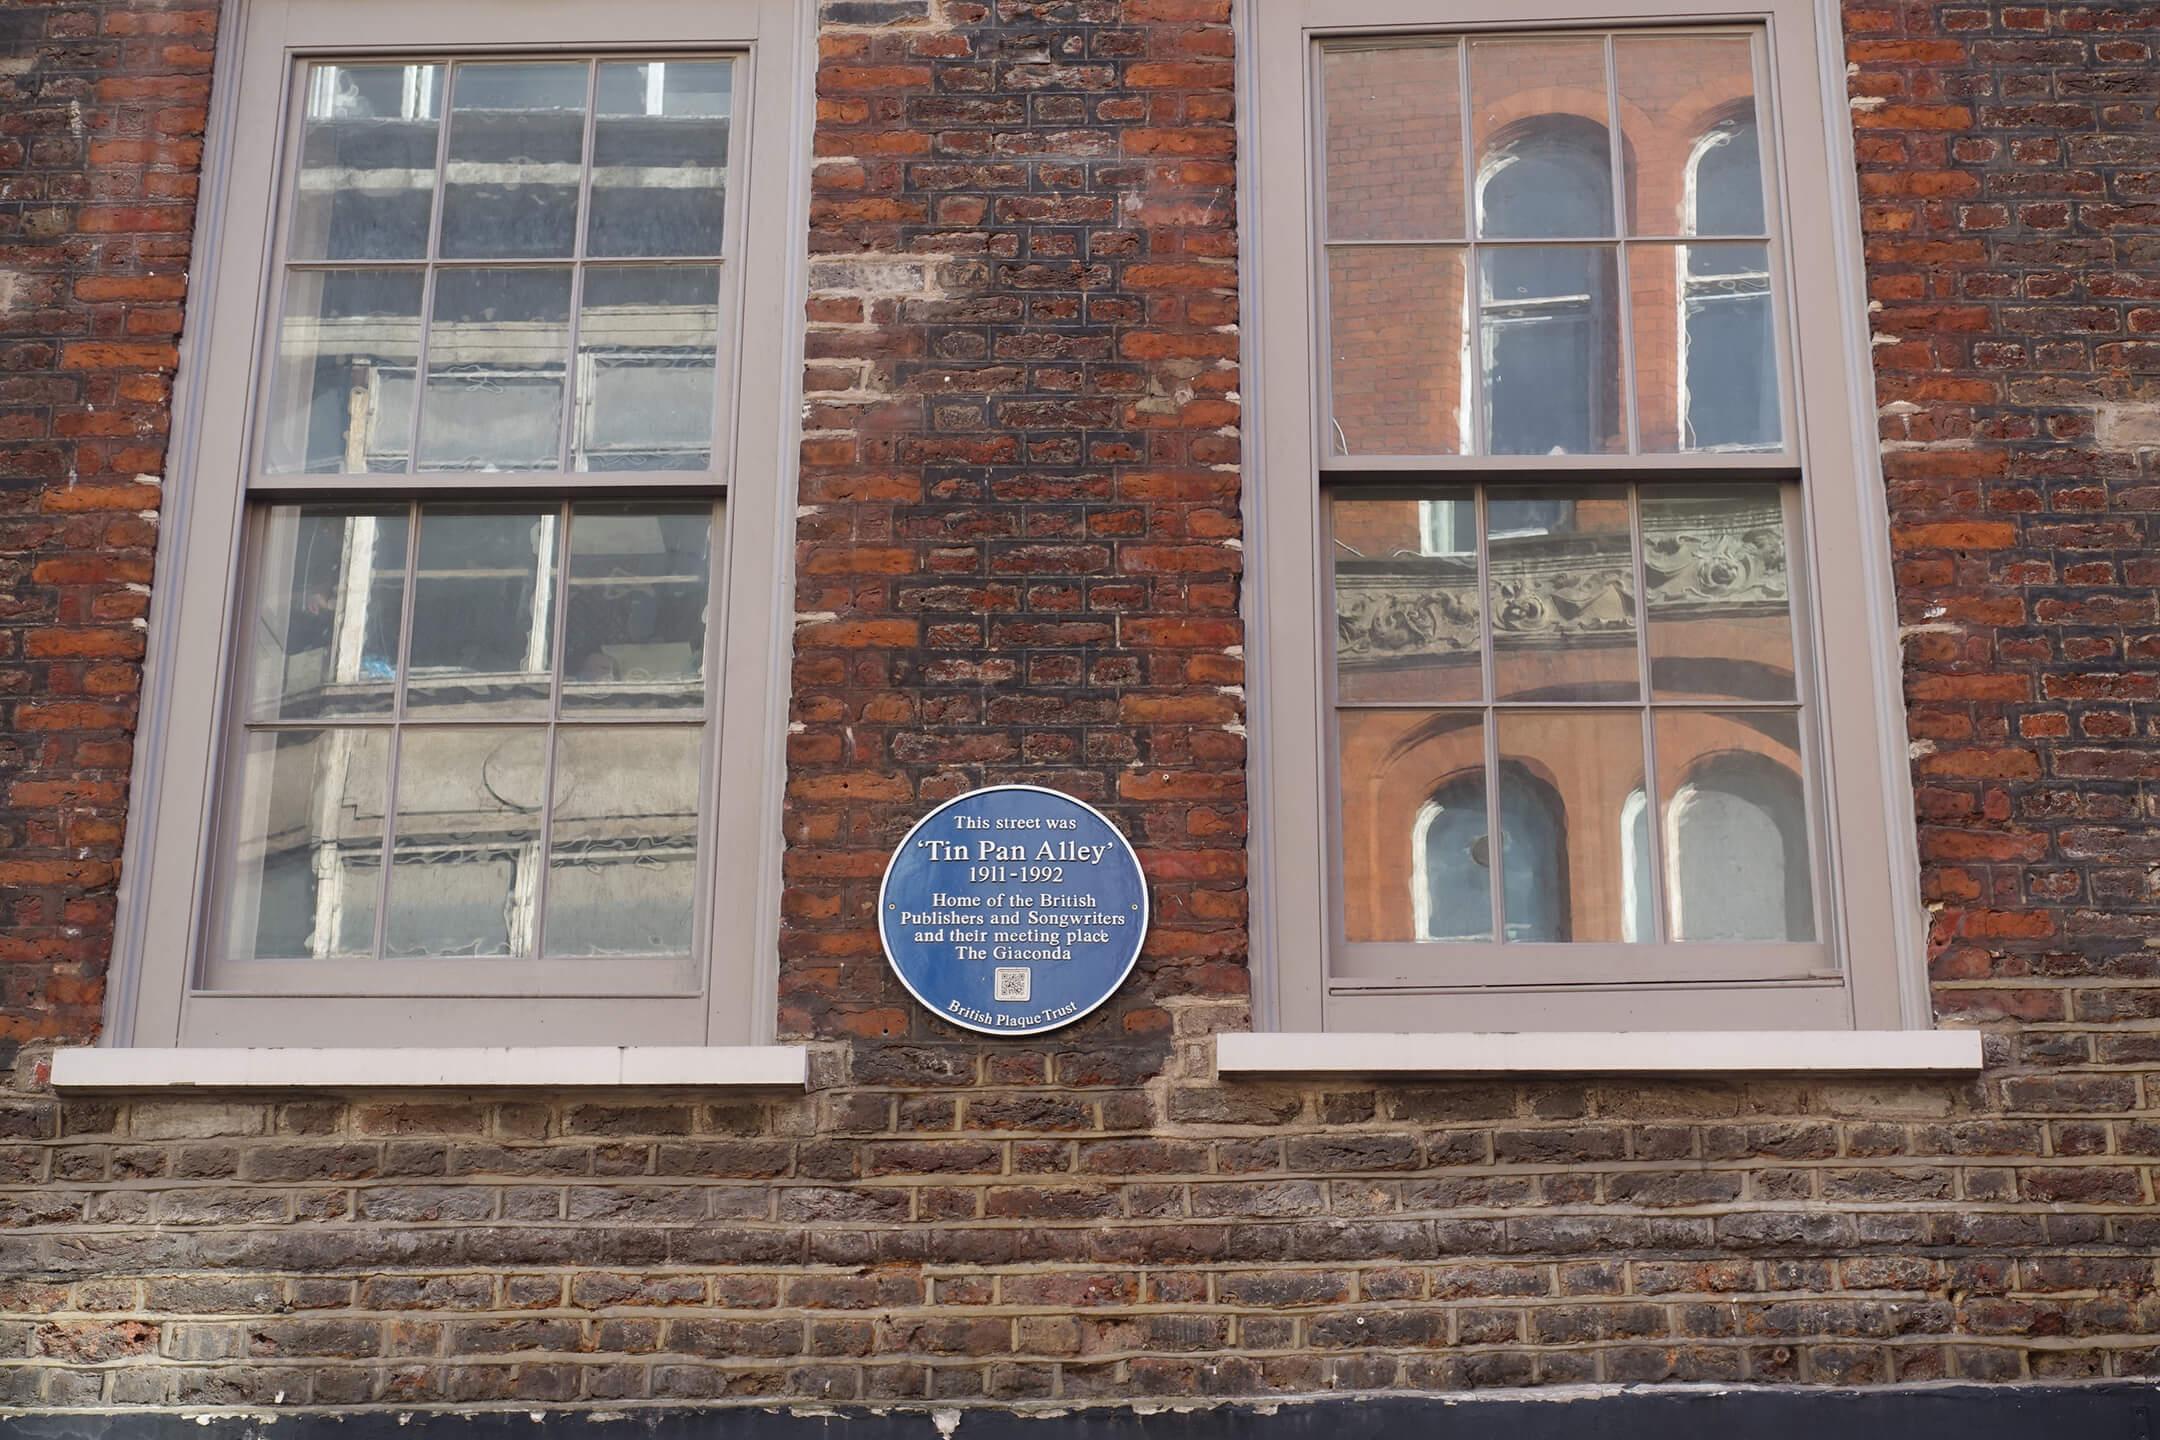 History Of Denmark Street